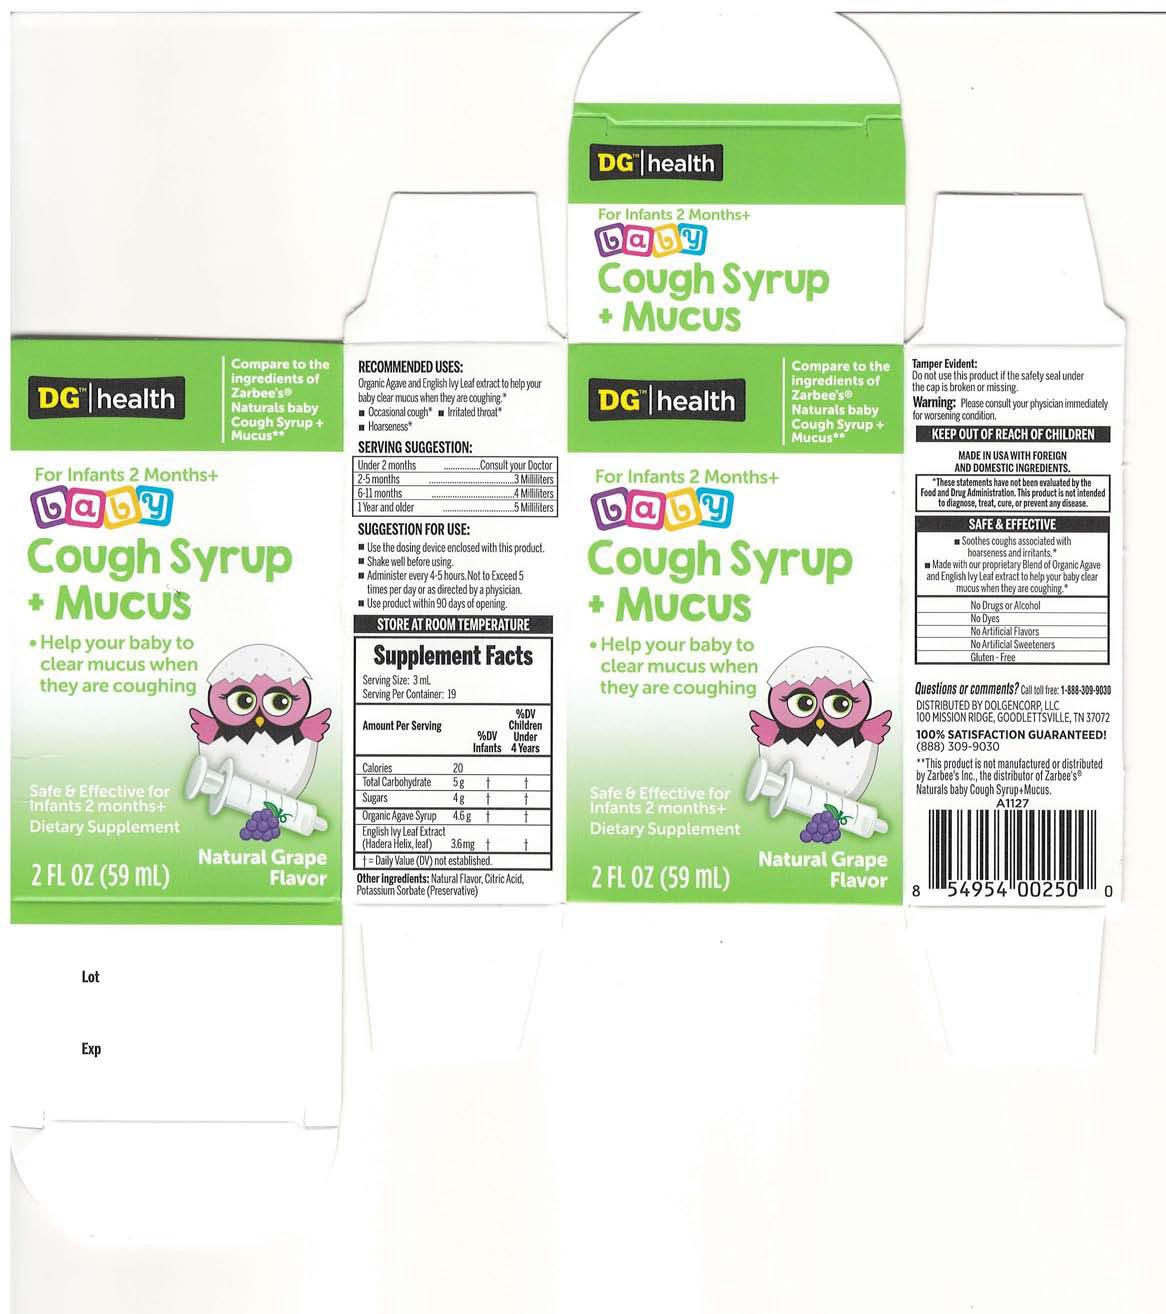 cough syrup recall_1553193053854.jpg.jpg